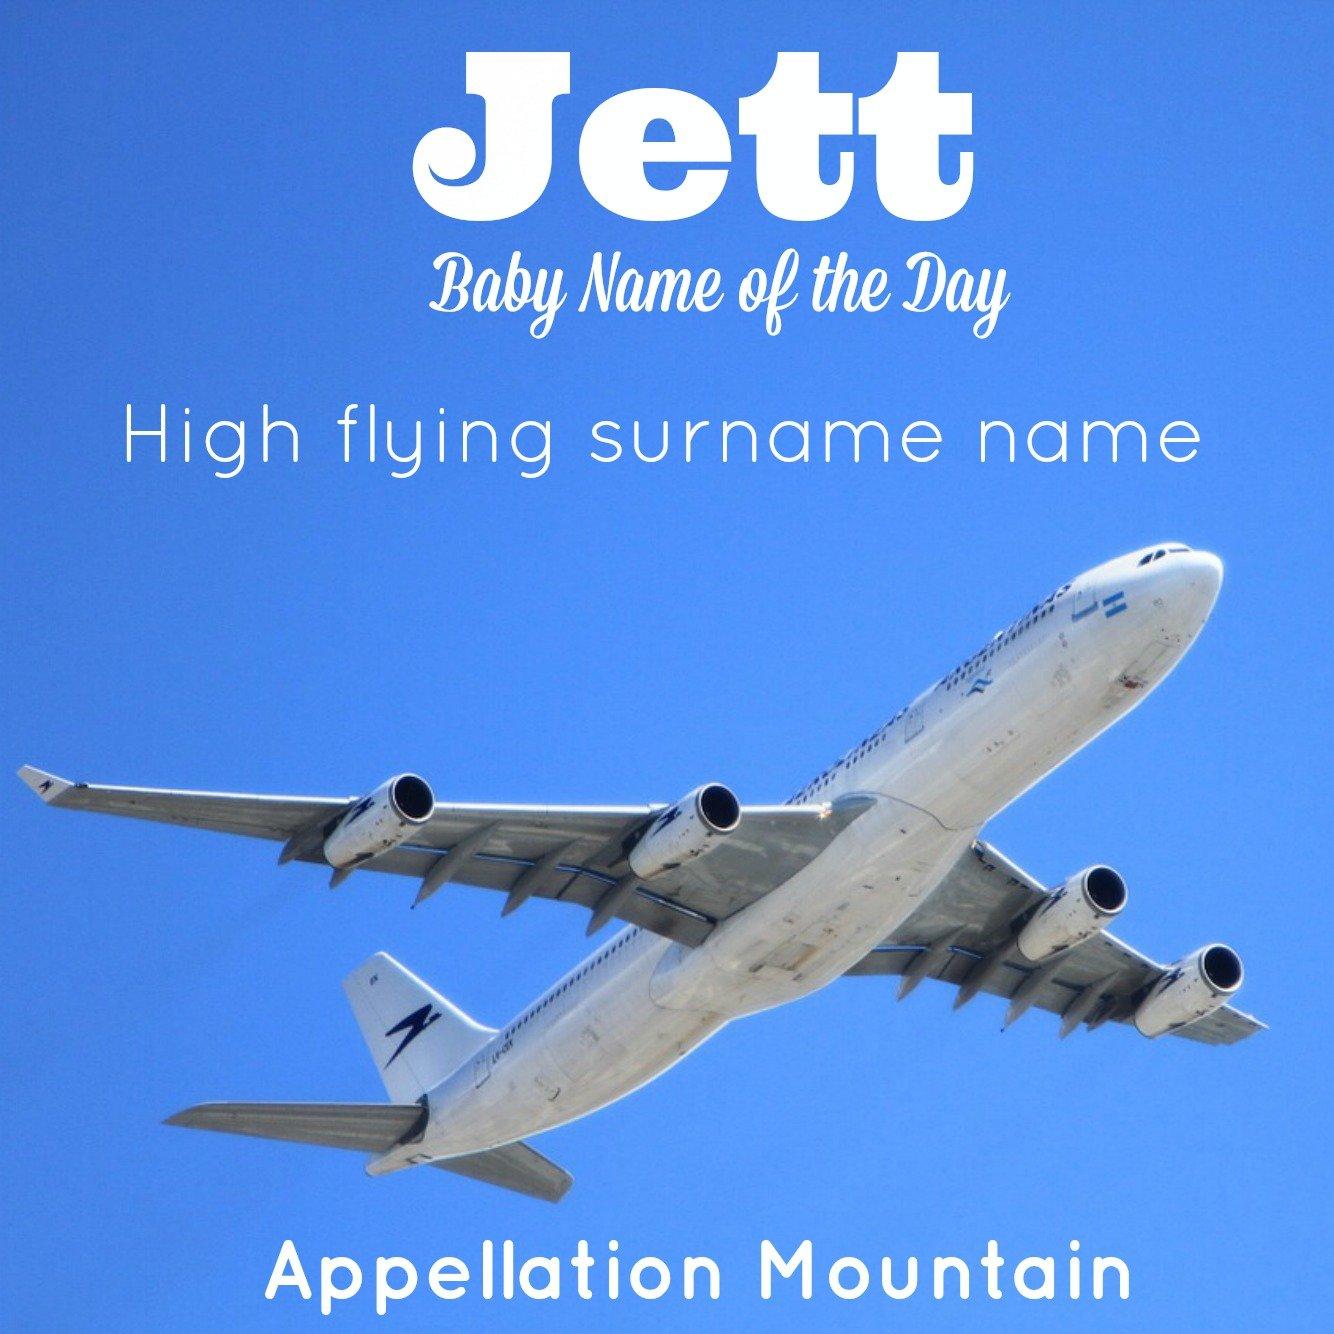 lisa-ling-baby-jet